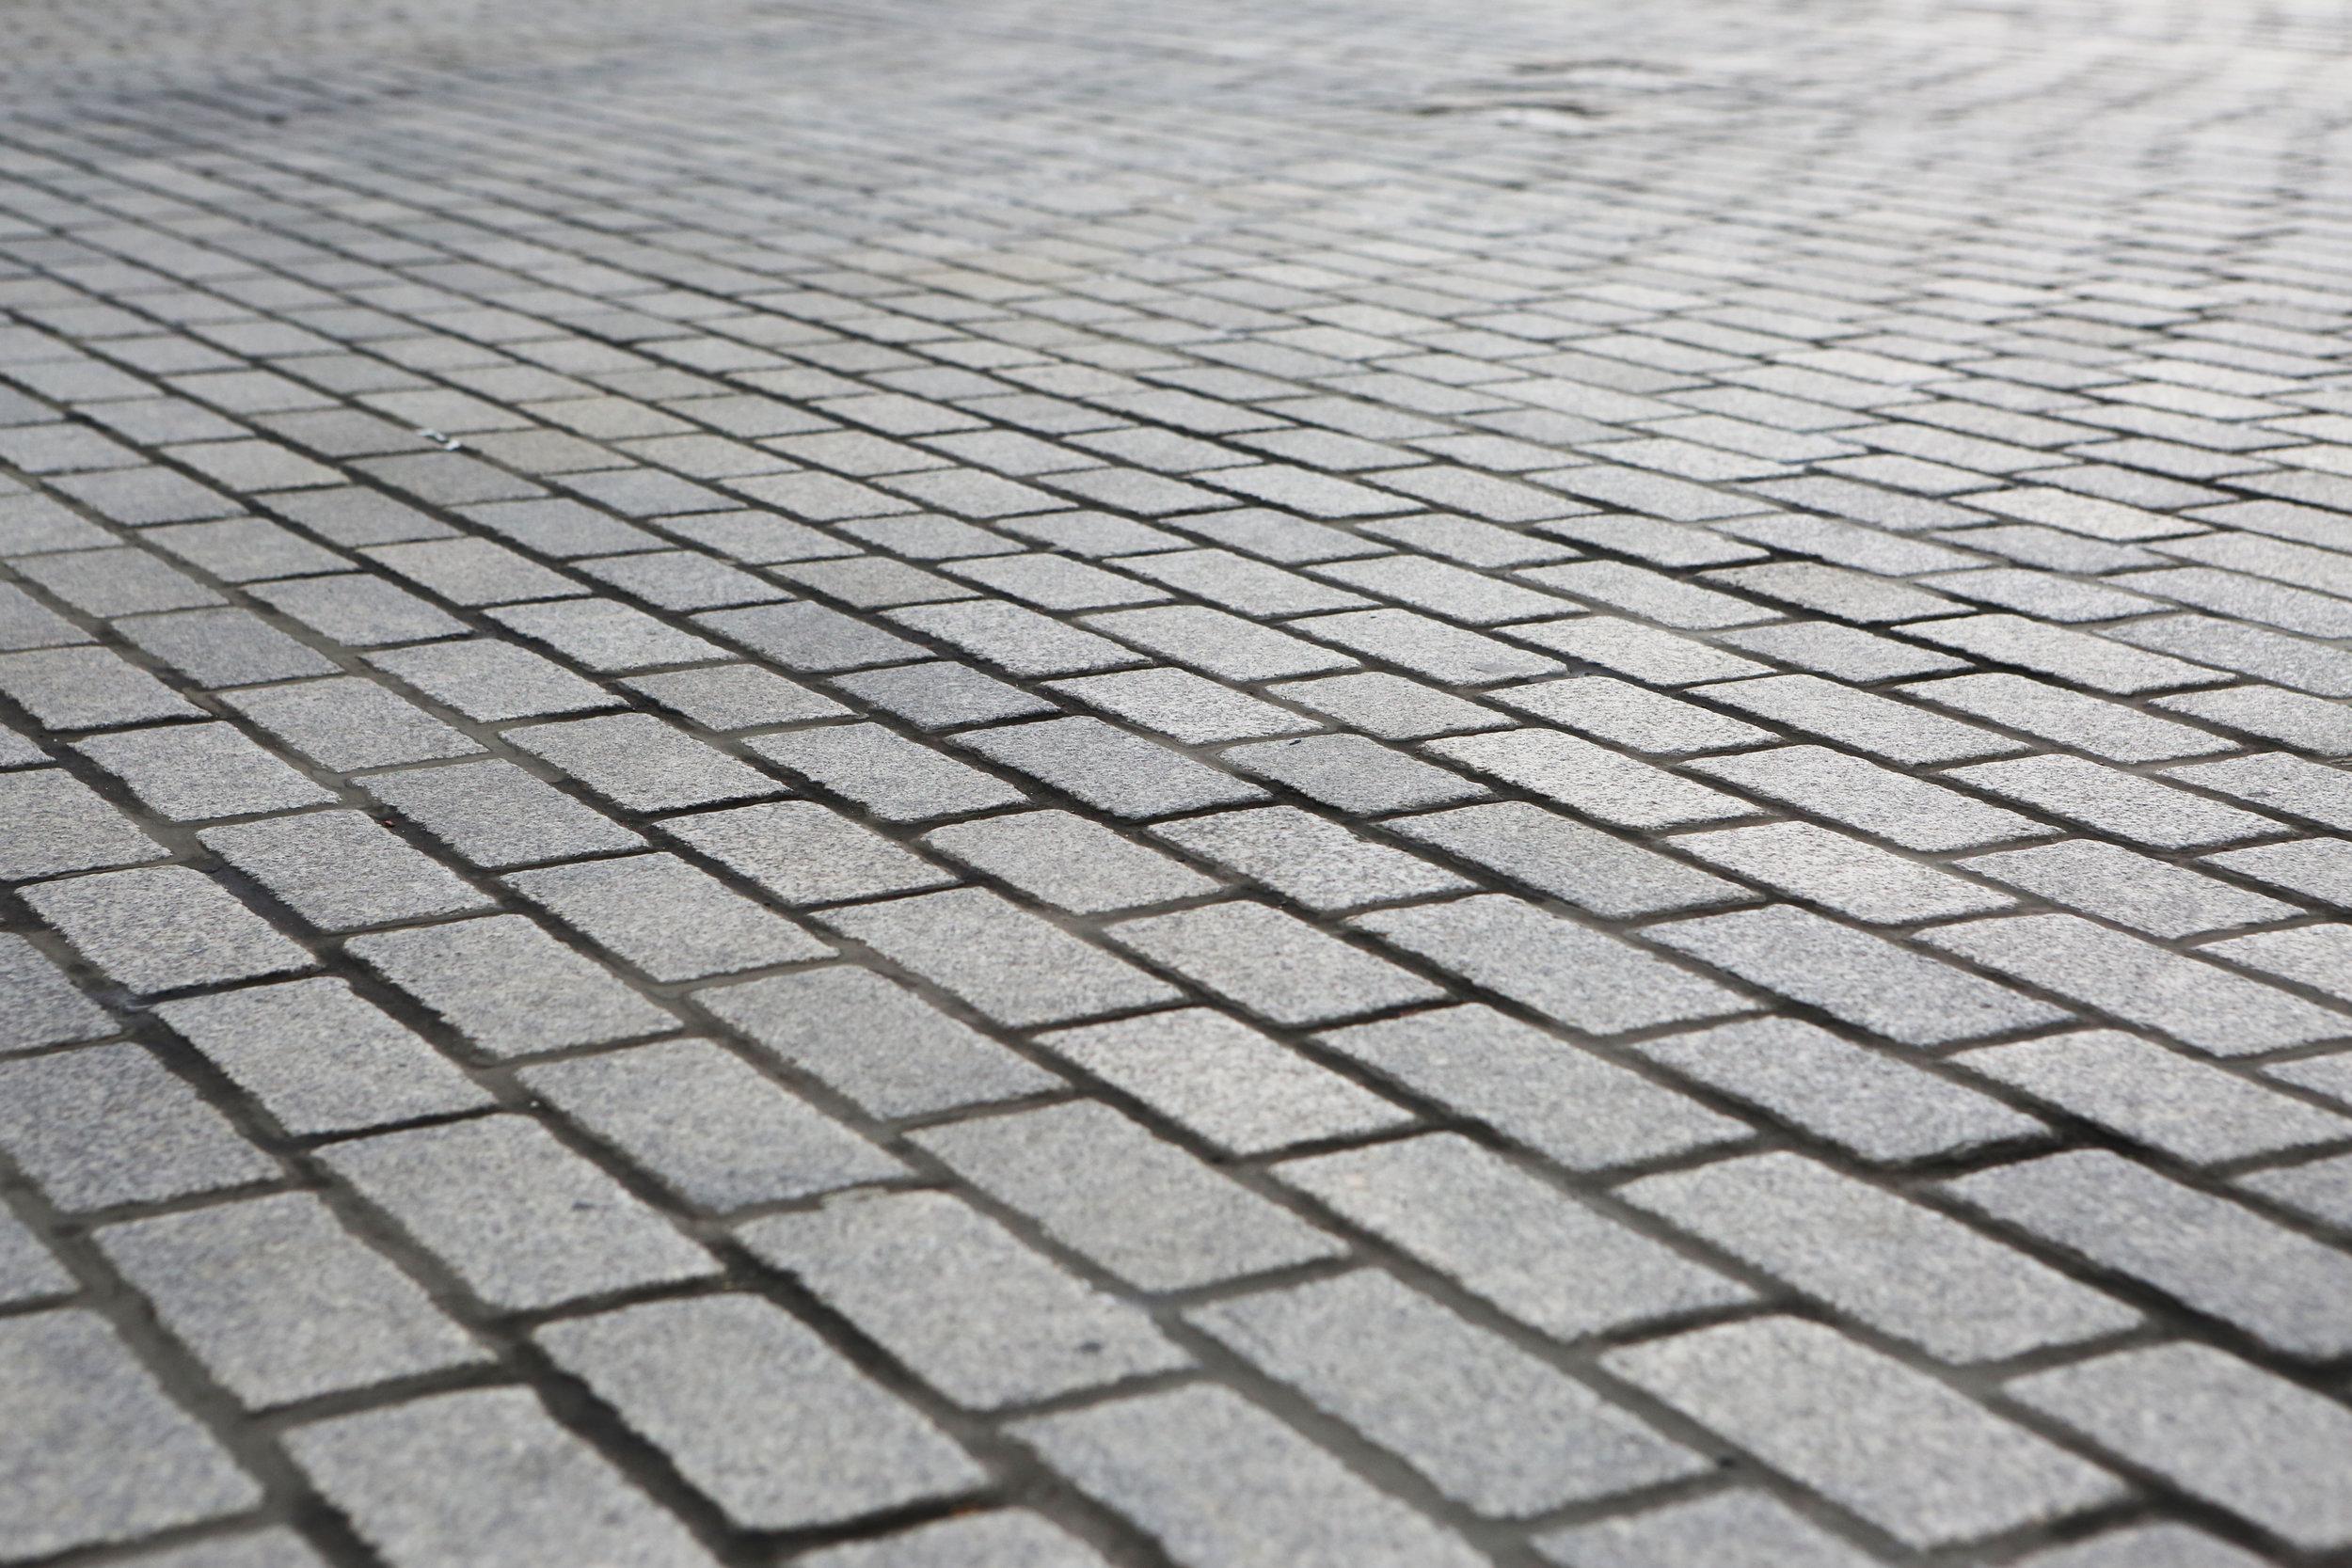 Brick and stone pavers